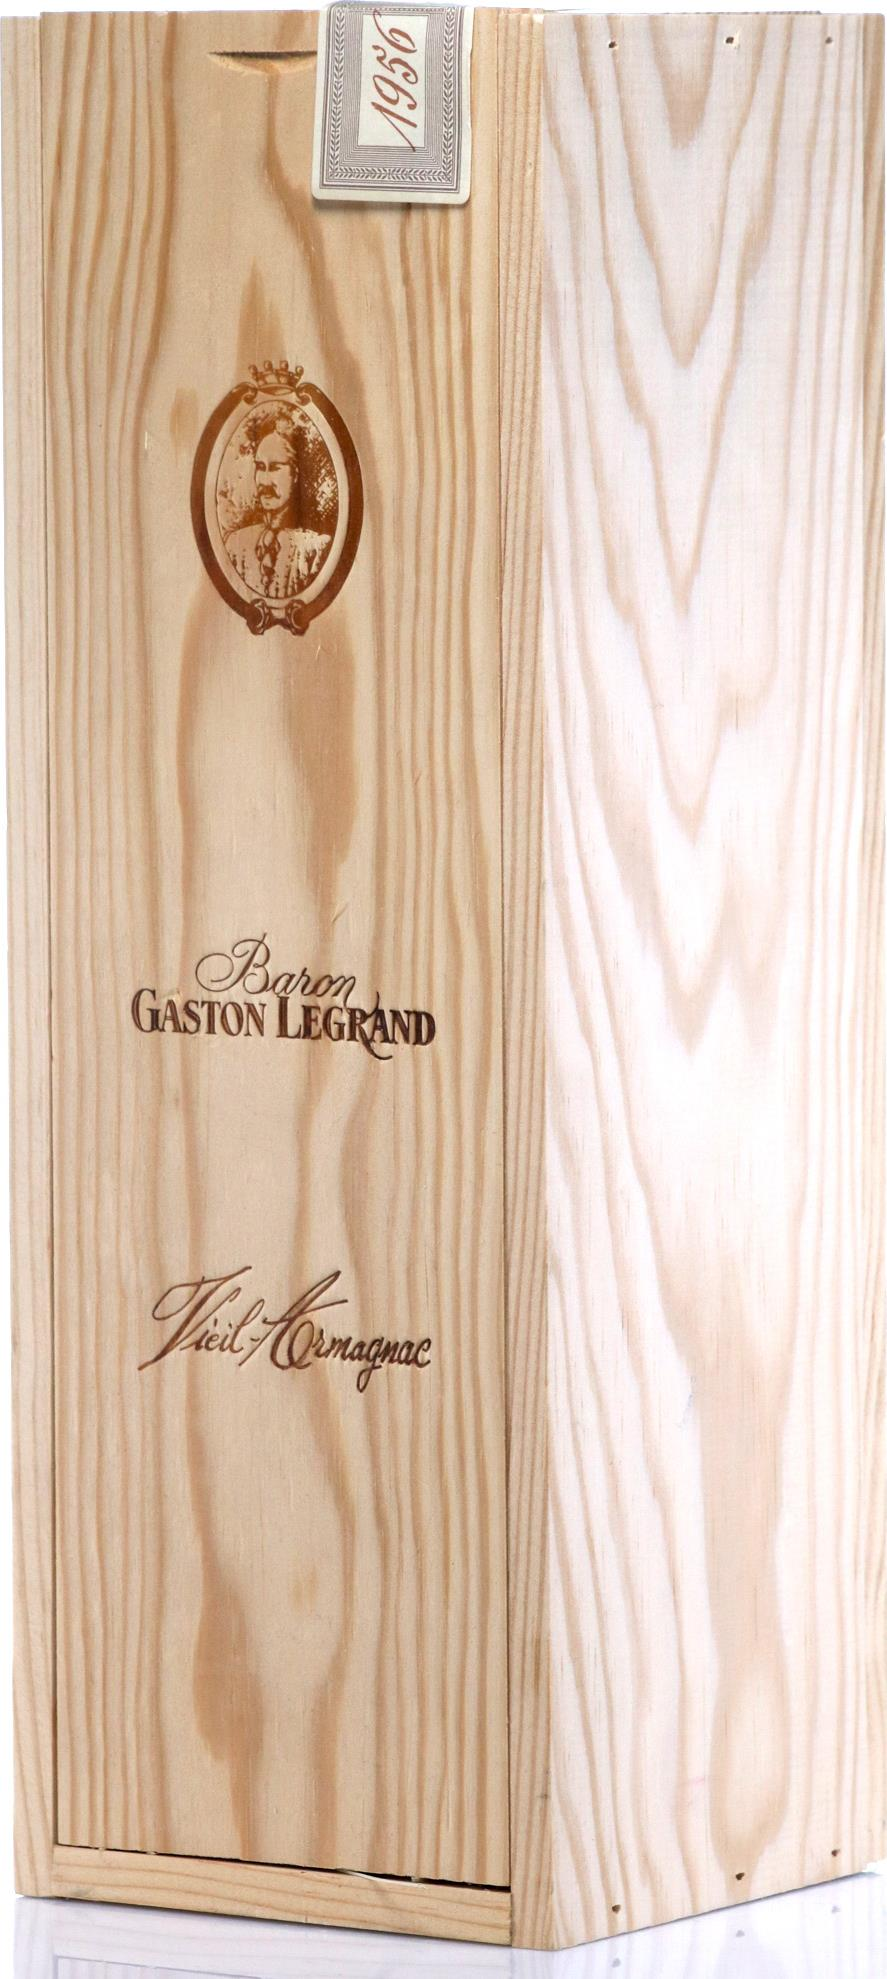 Armagnac 1956 Baron Gaston LeGrand